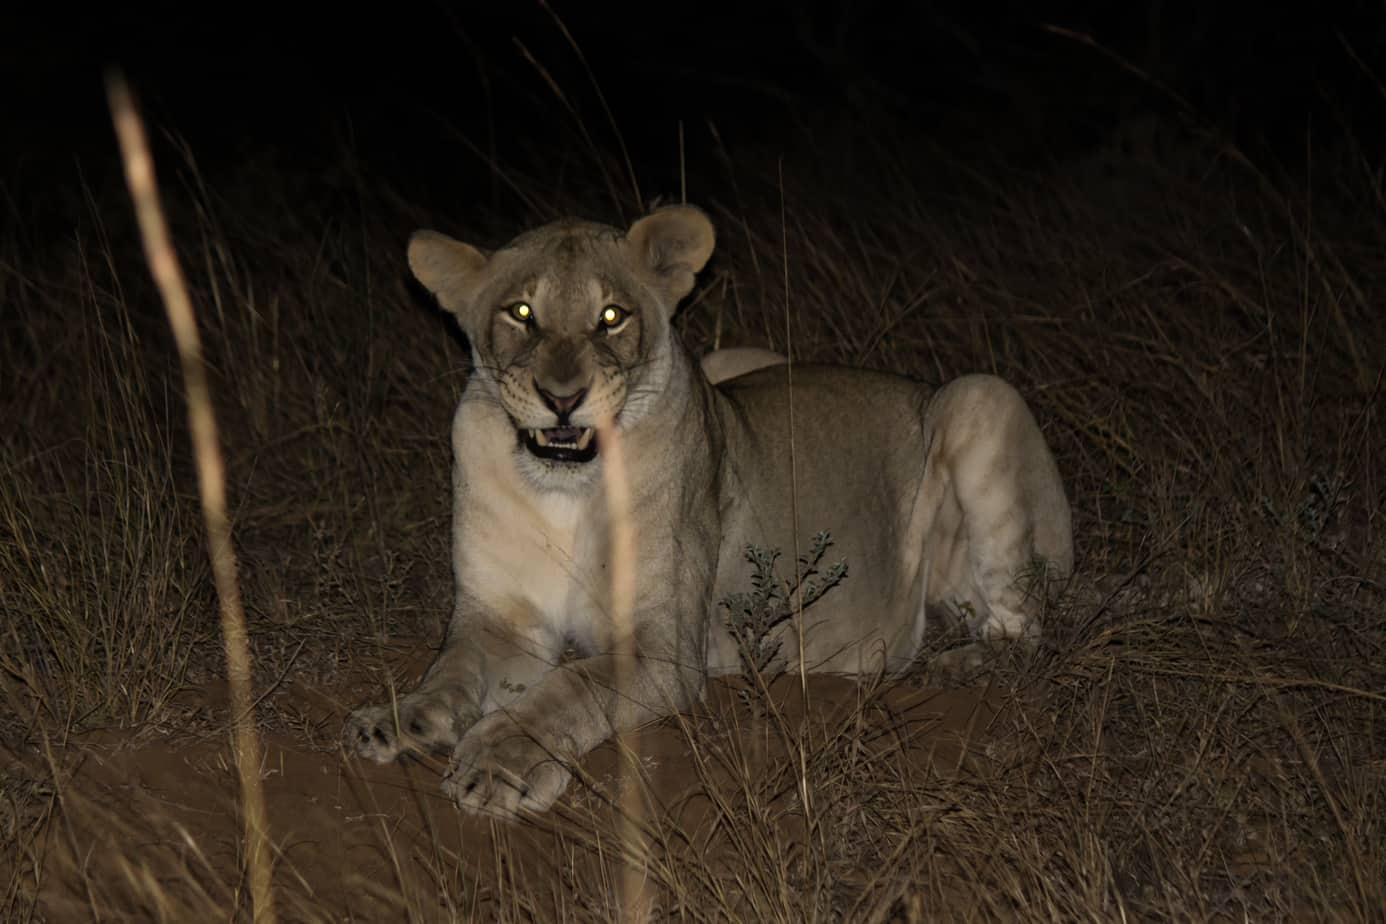 Løve om natta @ Tembe Elephant Park. Foto: Håvard Rosenlund